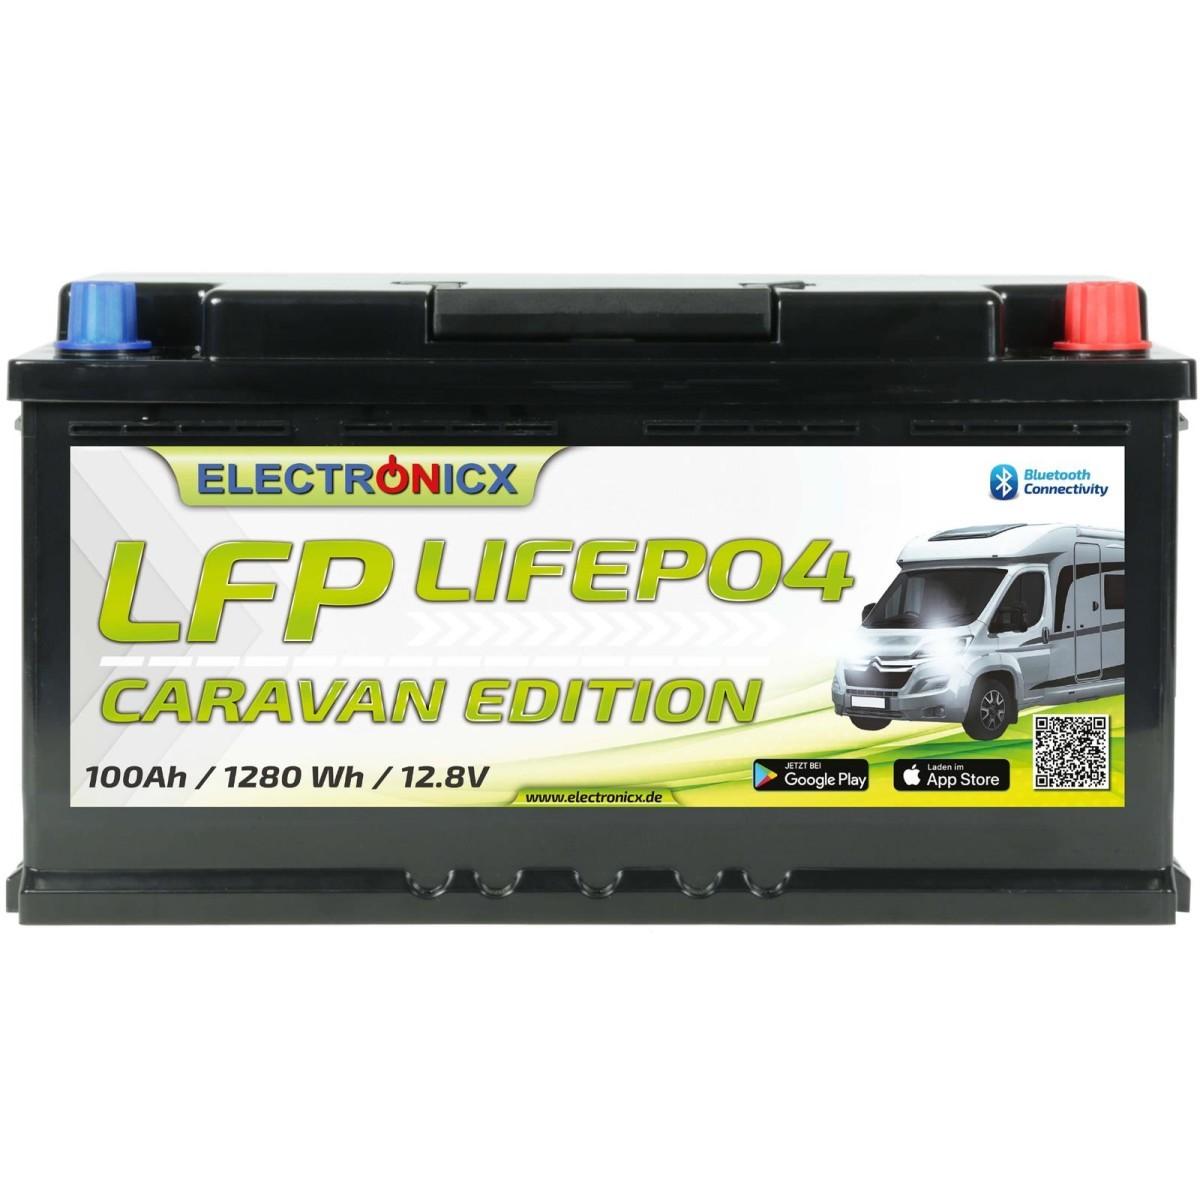 Electronicx Lifepo4 battery